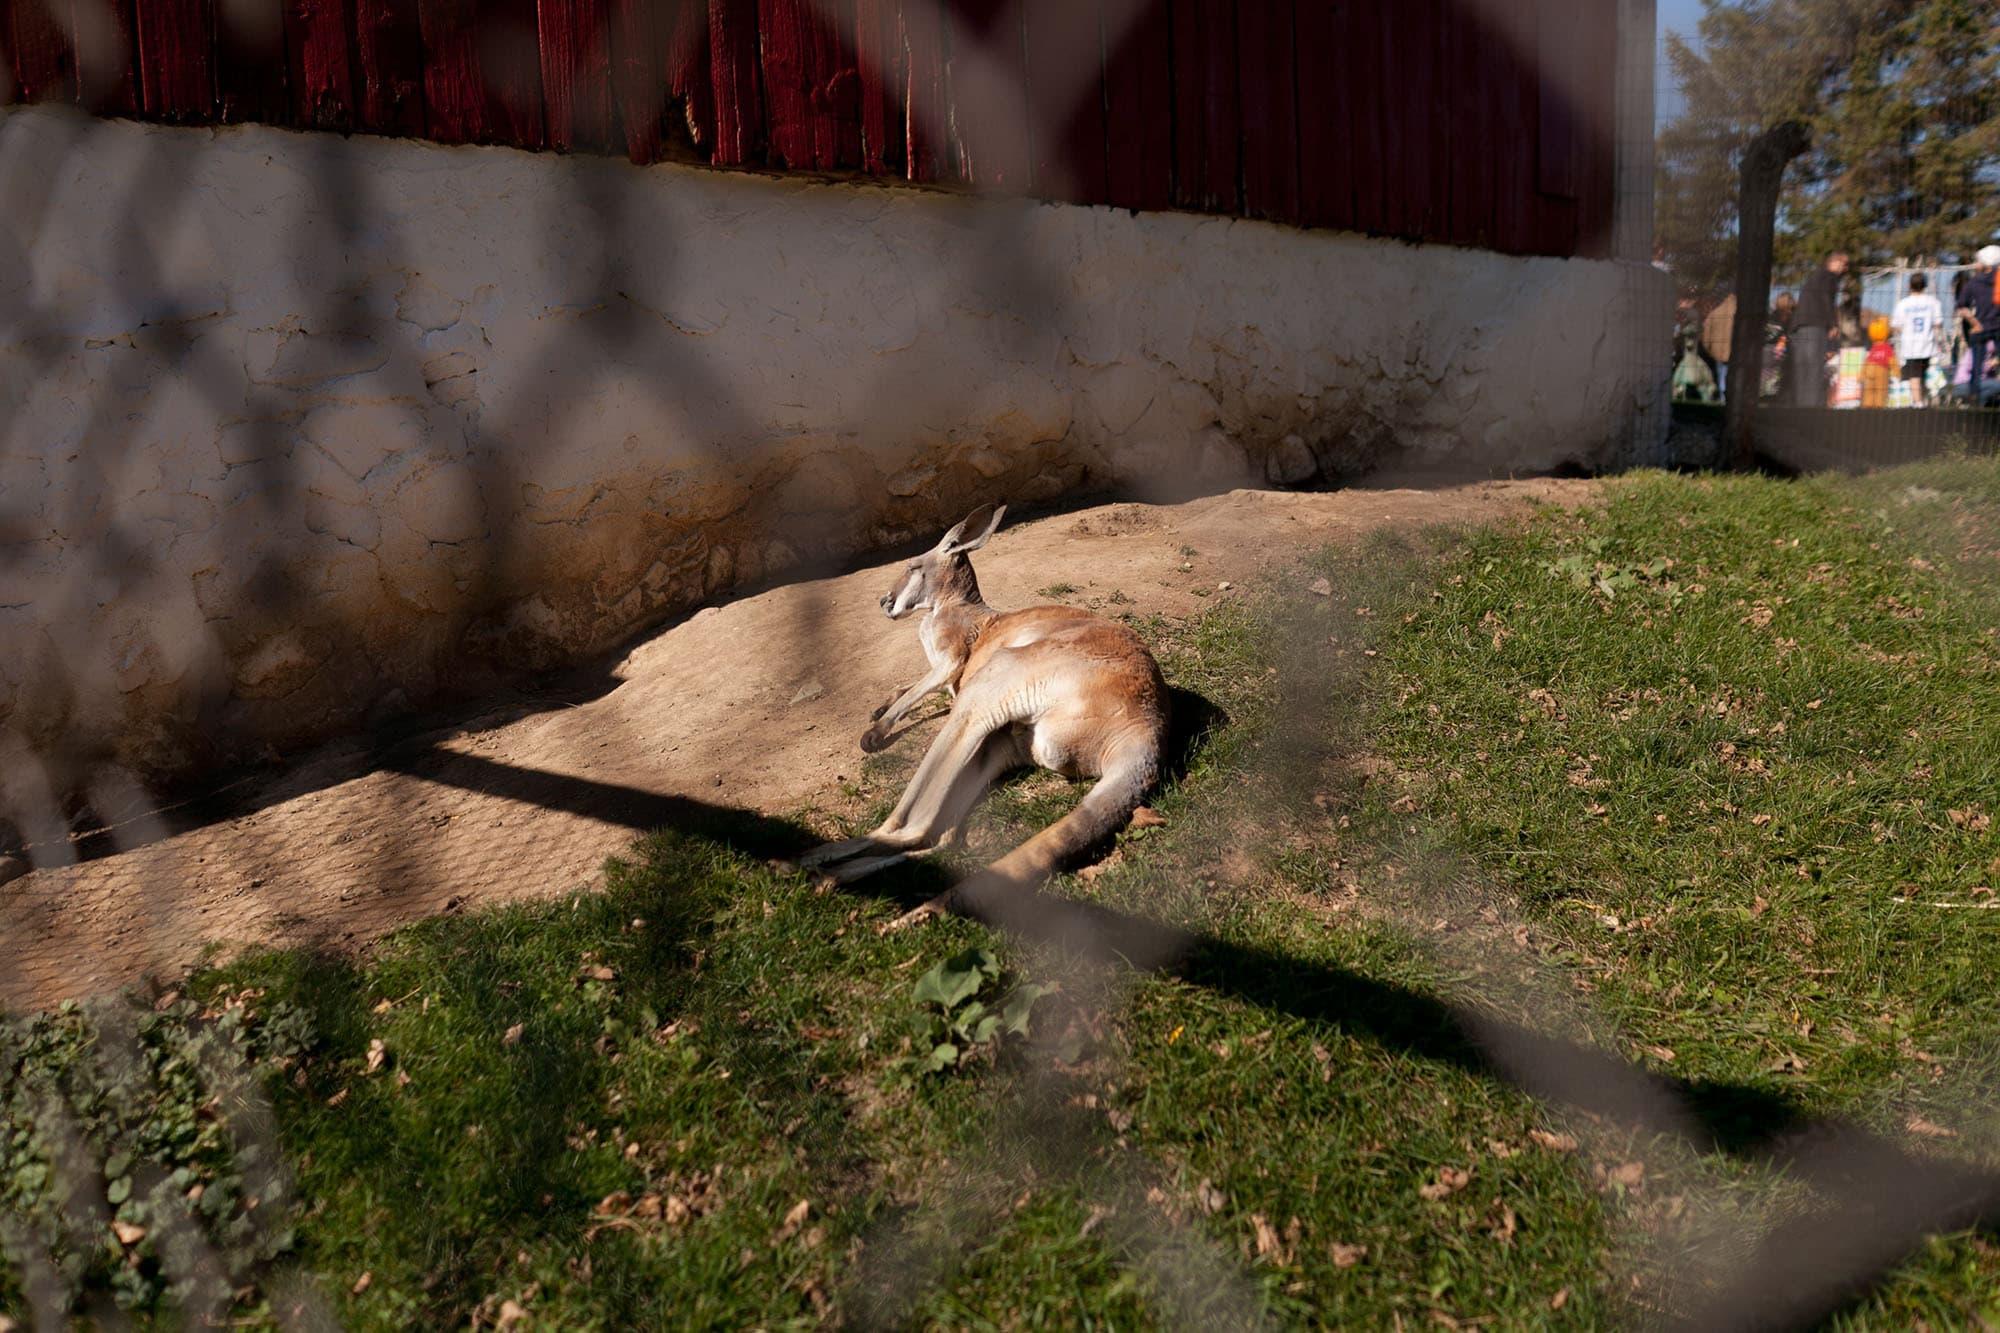 Kangaroo at Bear Den Zoo and Petting Farm in Wisconsin